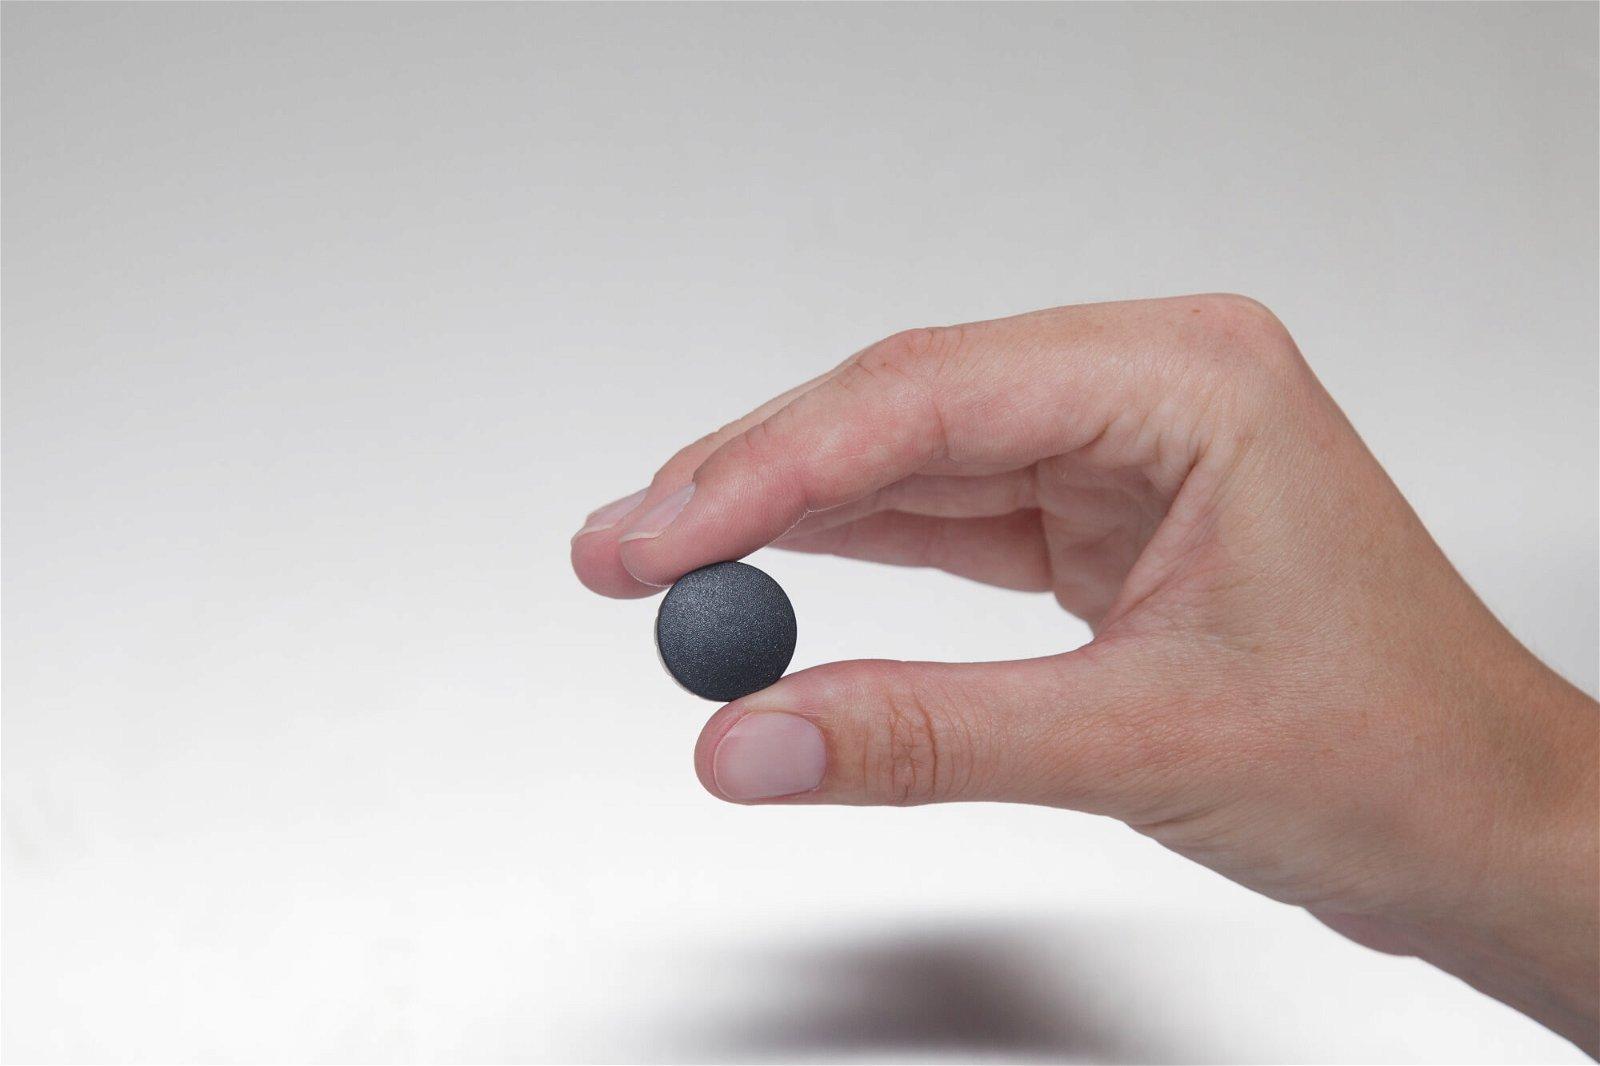 Magnet MAULsolid Ø 20 mm, 0,3 kg Haftkraft, 10 St./Ktn., schwarz